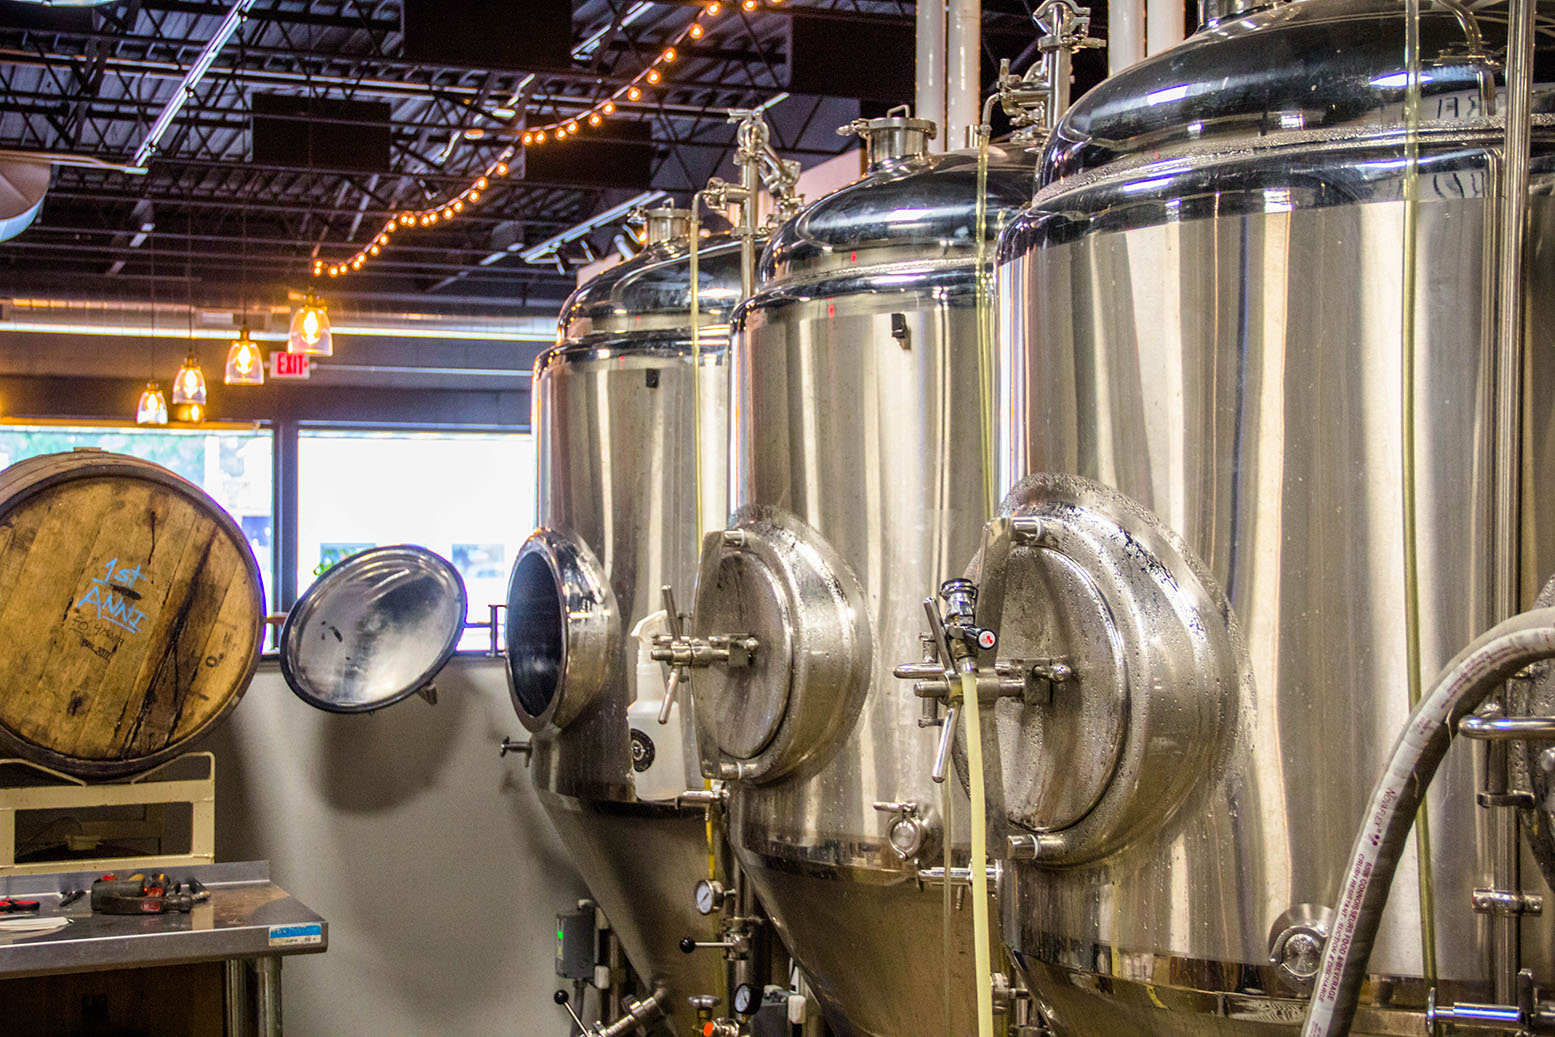 Fermenting Tanks at Barrel 41 Brewing Company